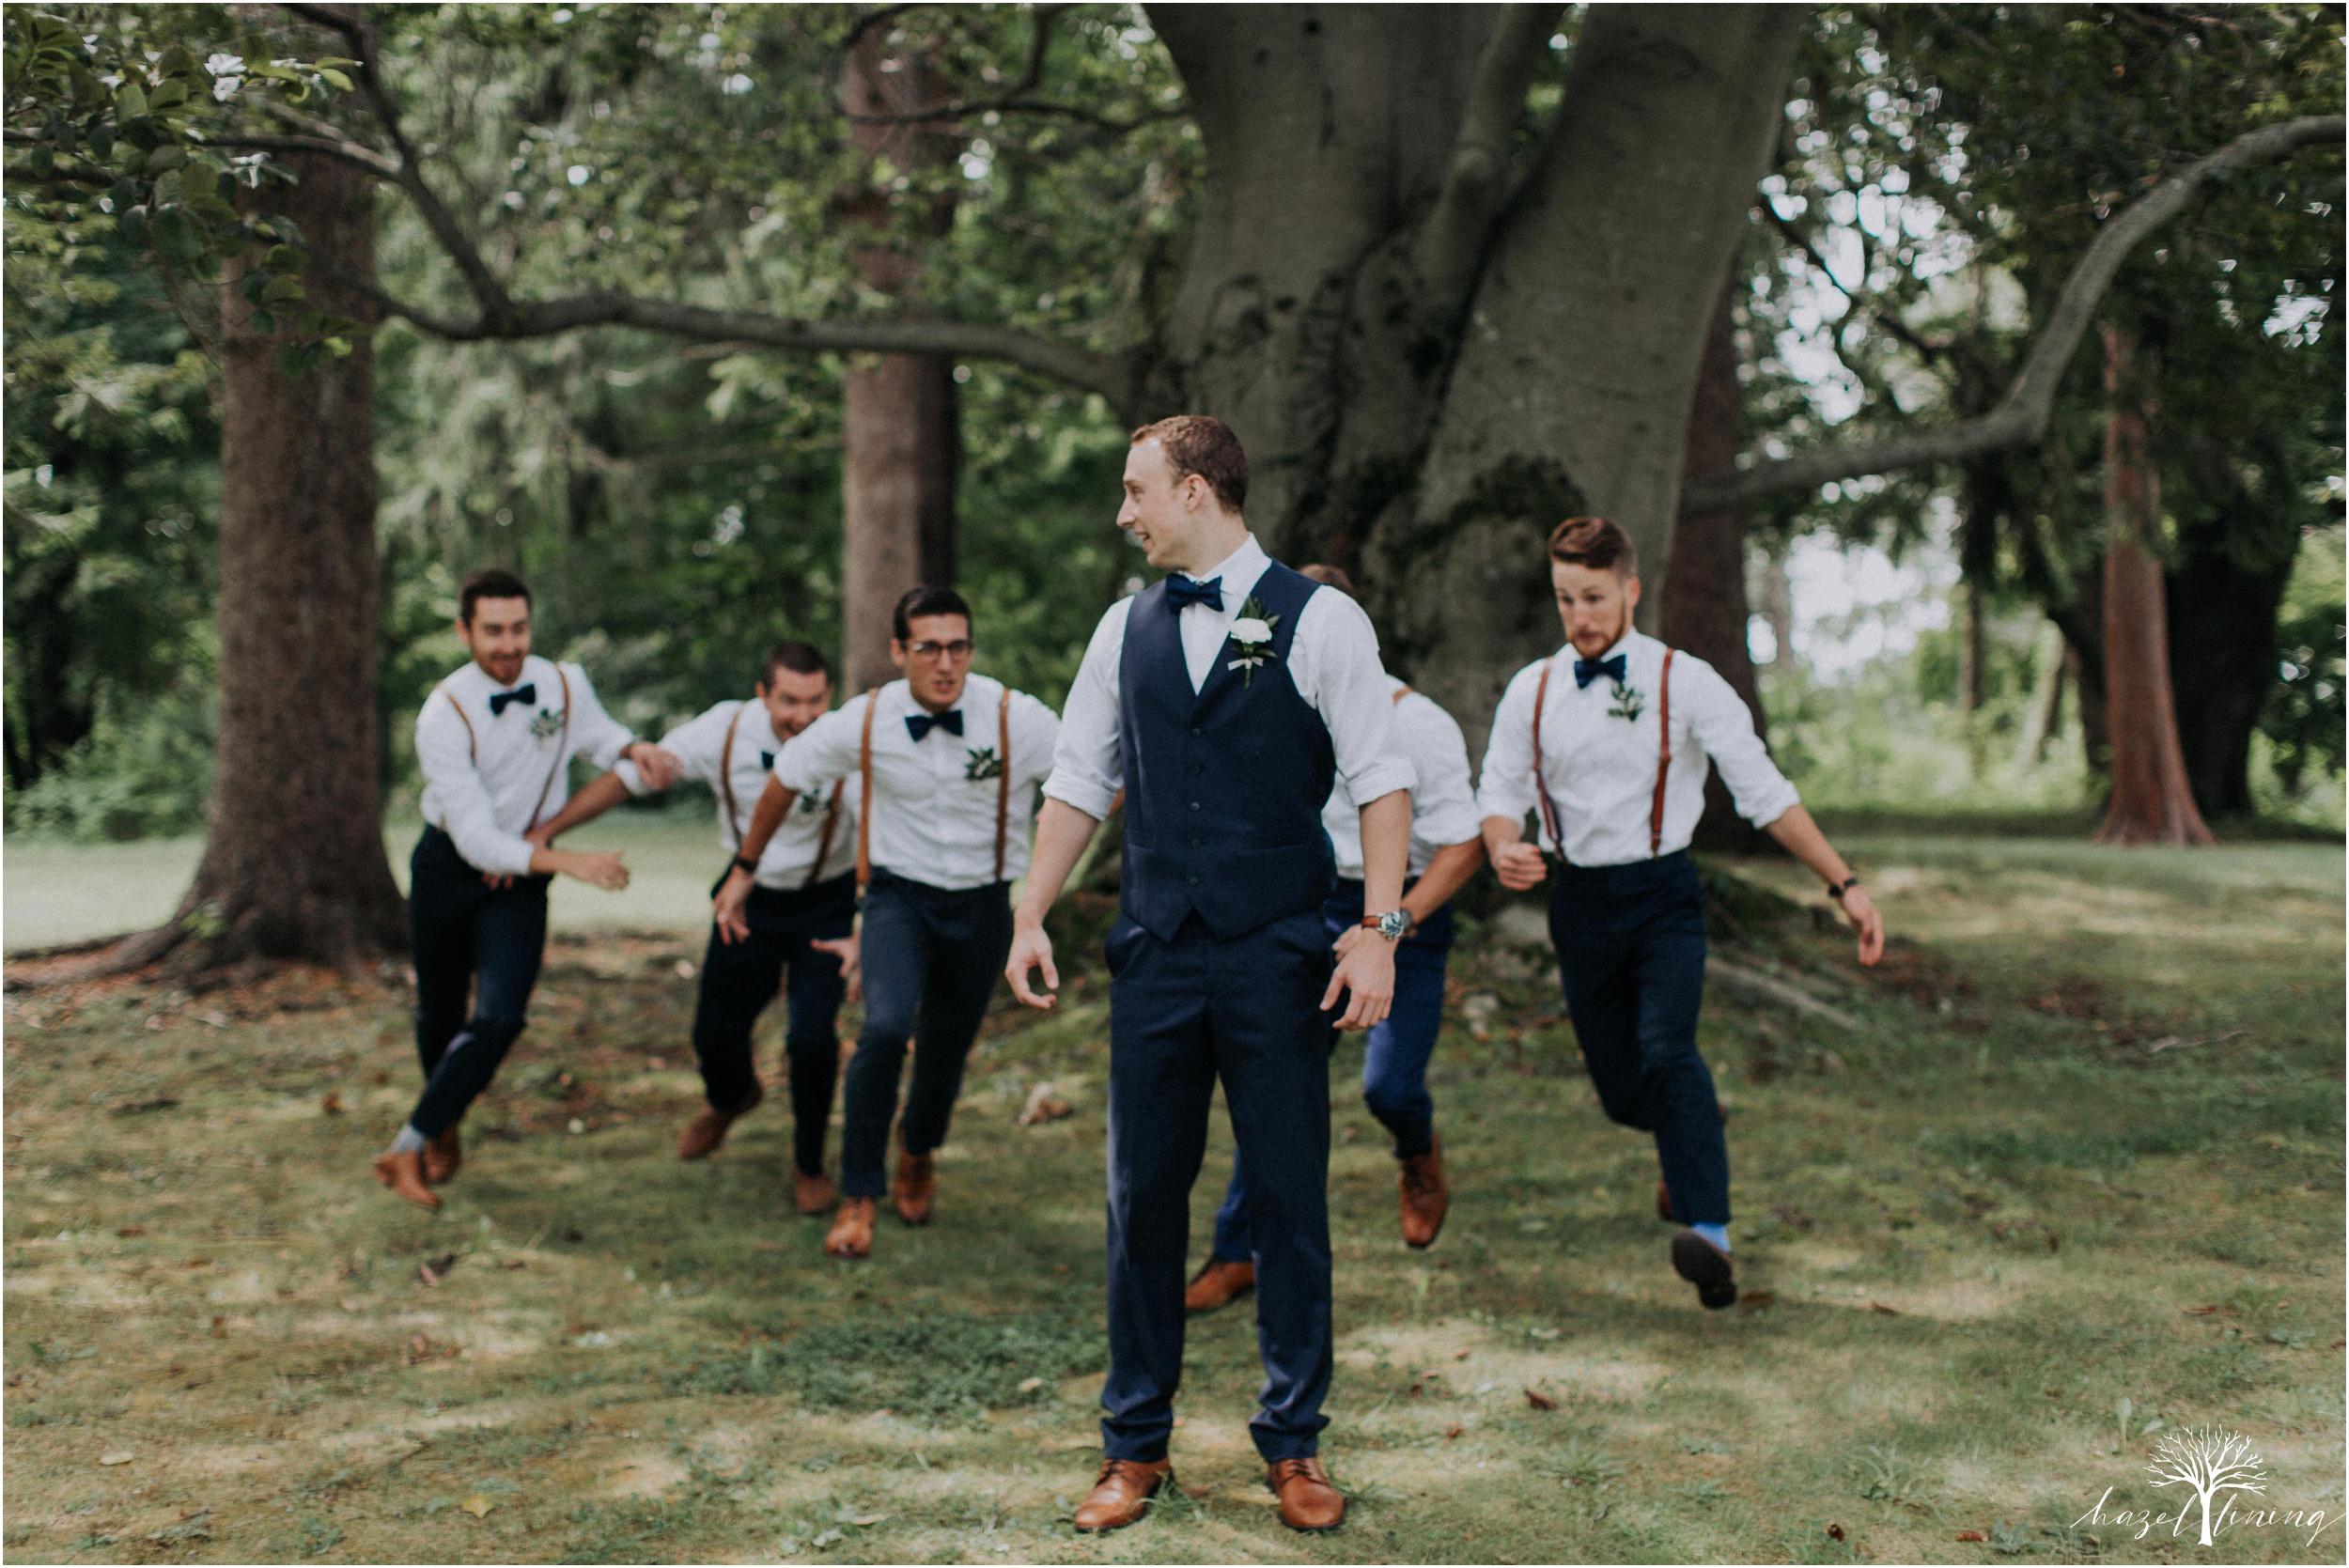 mariah-kreyling-samuel-sherratt-sherrattwiththeworld-peirce-farm-at-witch-hill-boston-massachusetts-wedding-photography-hazel-lining-travel-wedding-elopement-photography_0065.jpg